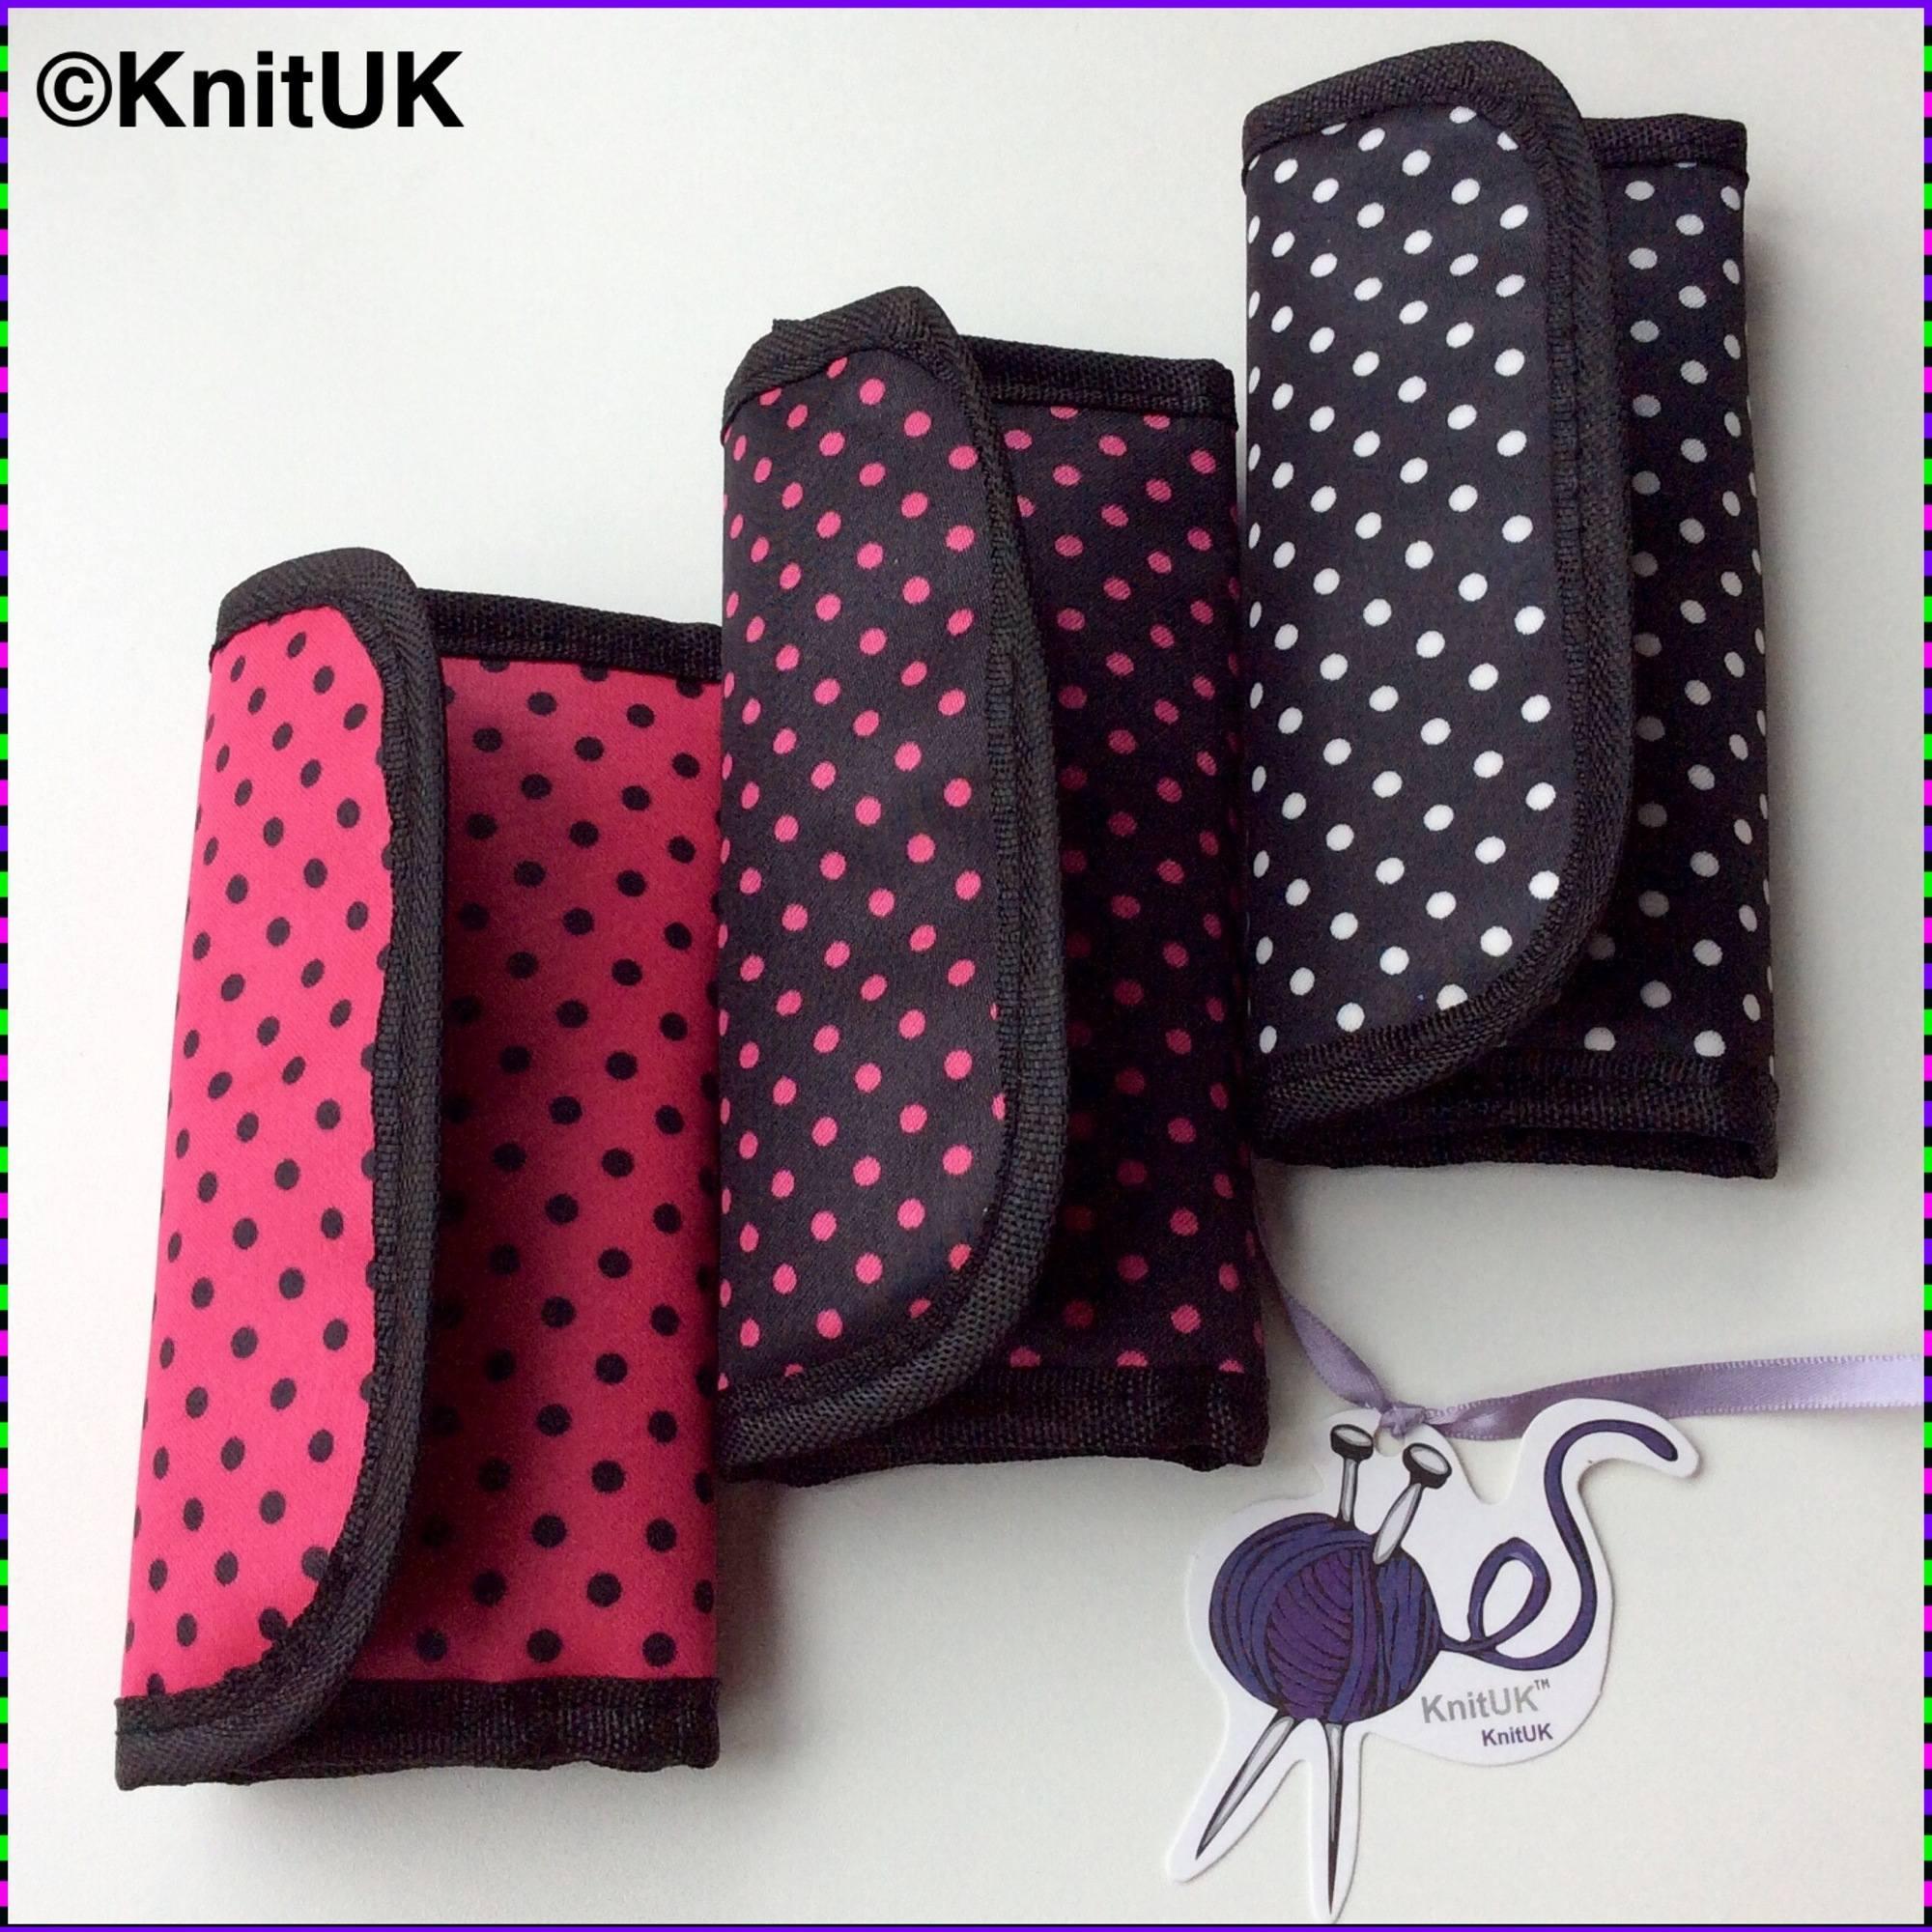 knituk crochet hook set 3 bags